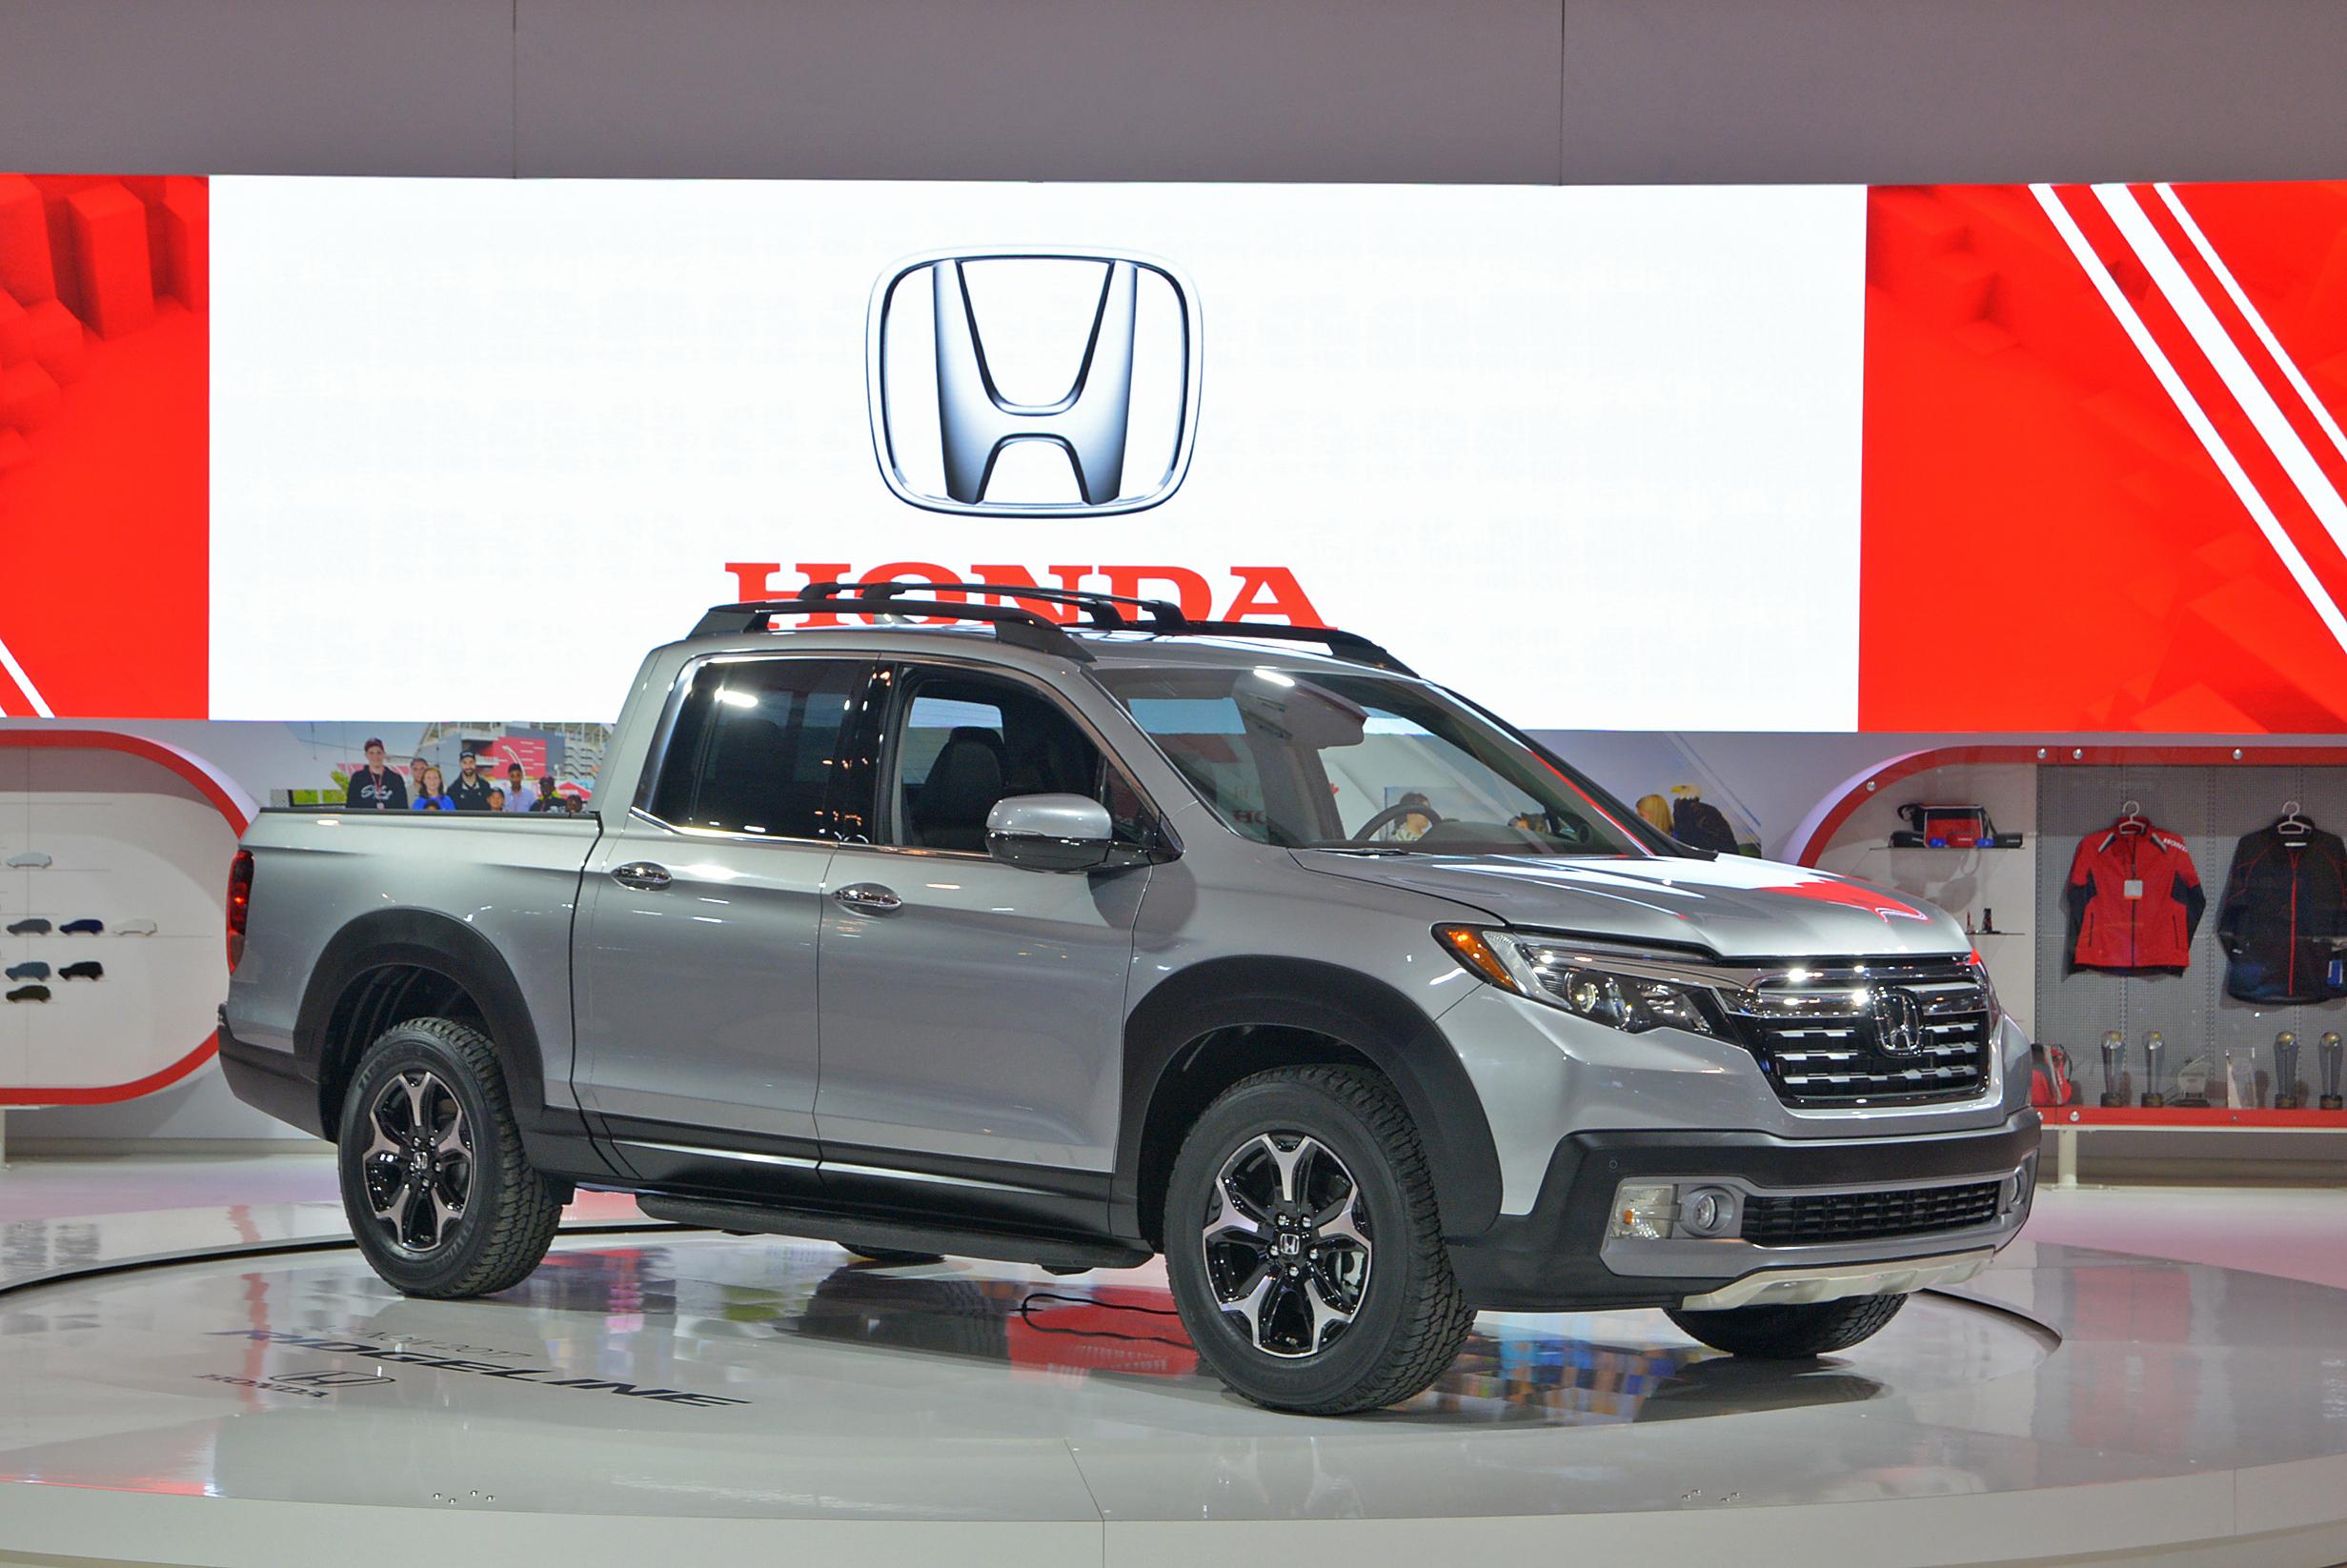 All-New 2017 Honda Ridgeline Pickup Truck Makes Canadian Debut at ...